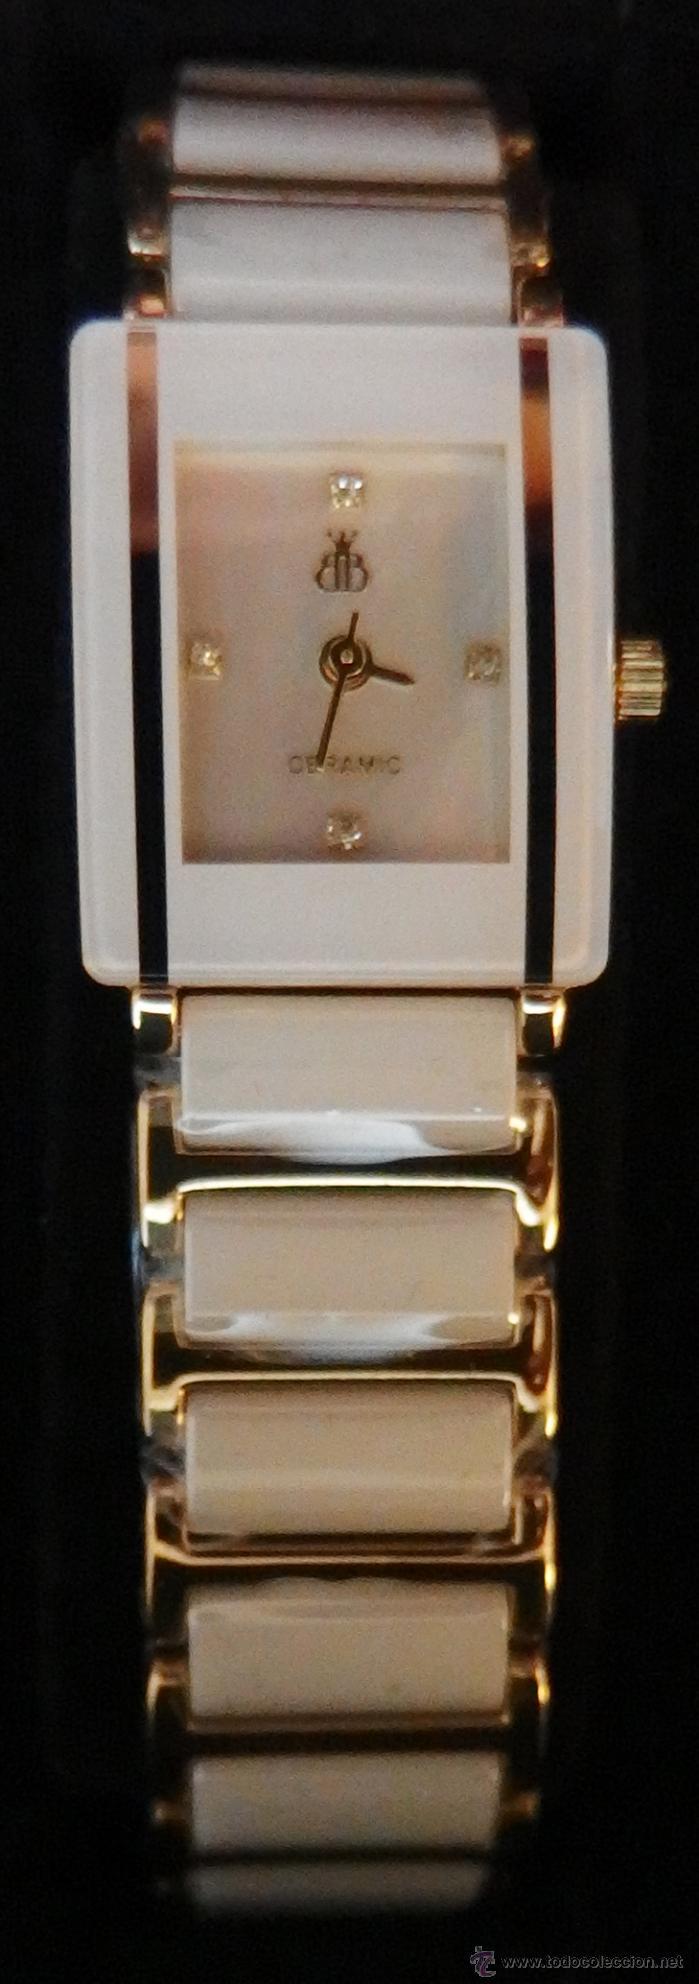 6f812cdc7d03 Relojes  RELOJ MARCA BROOKS   BENTLEY DE MUJER NUEVO - Foto 2 - 37216821